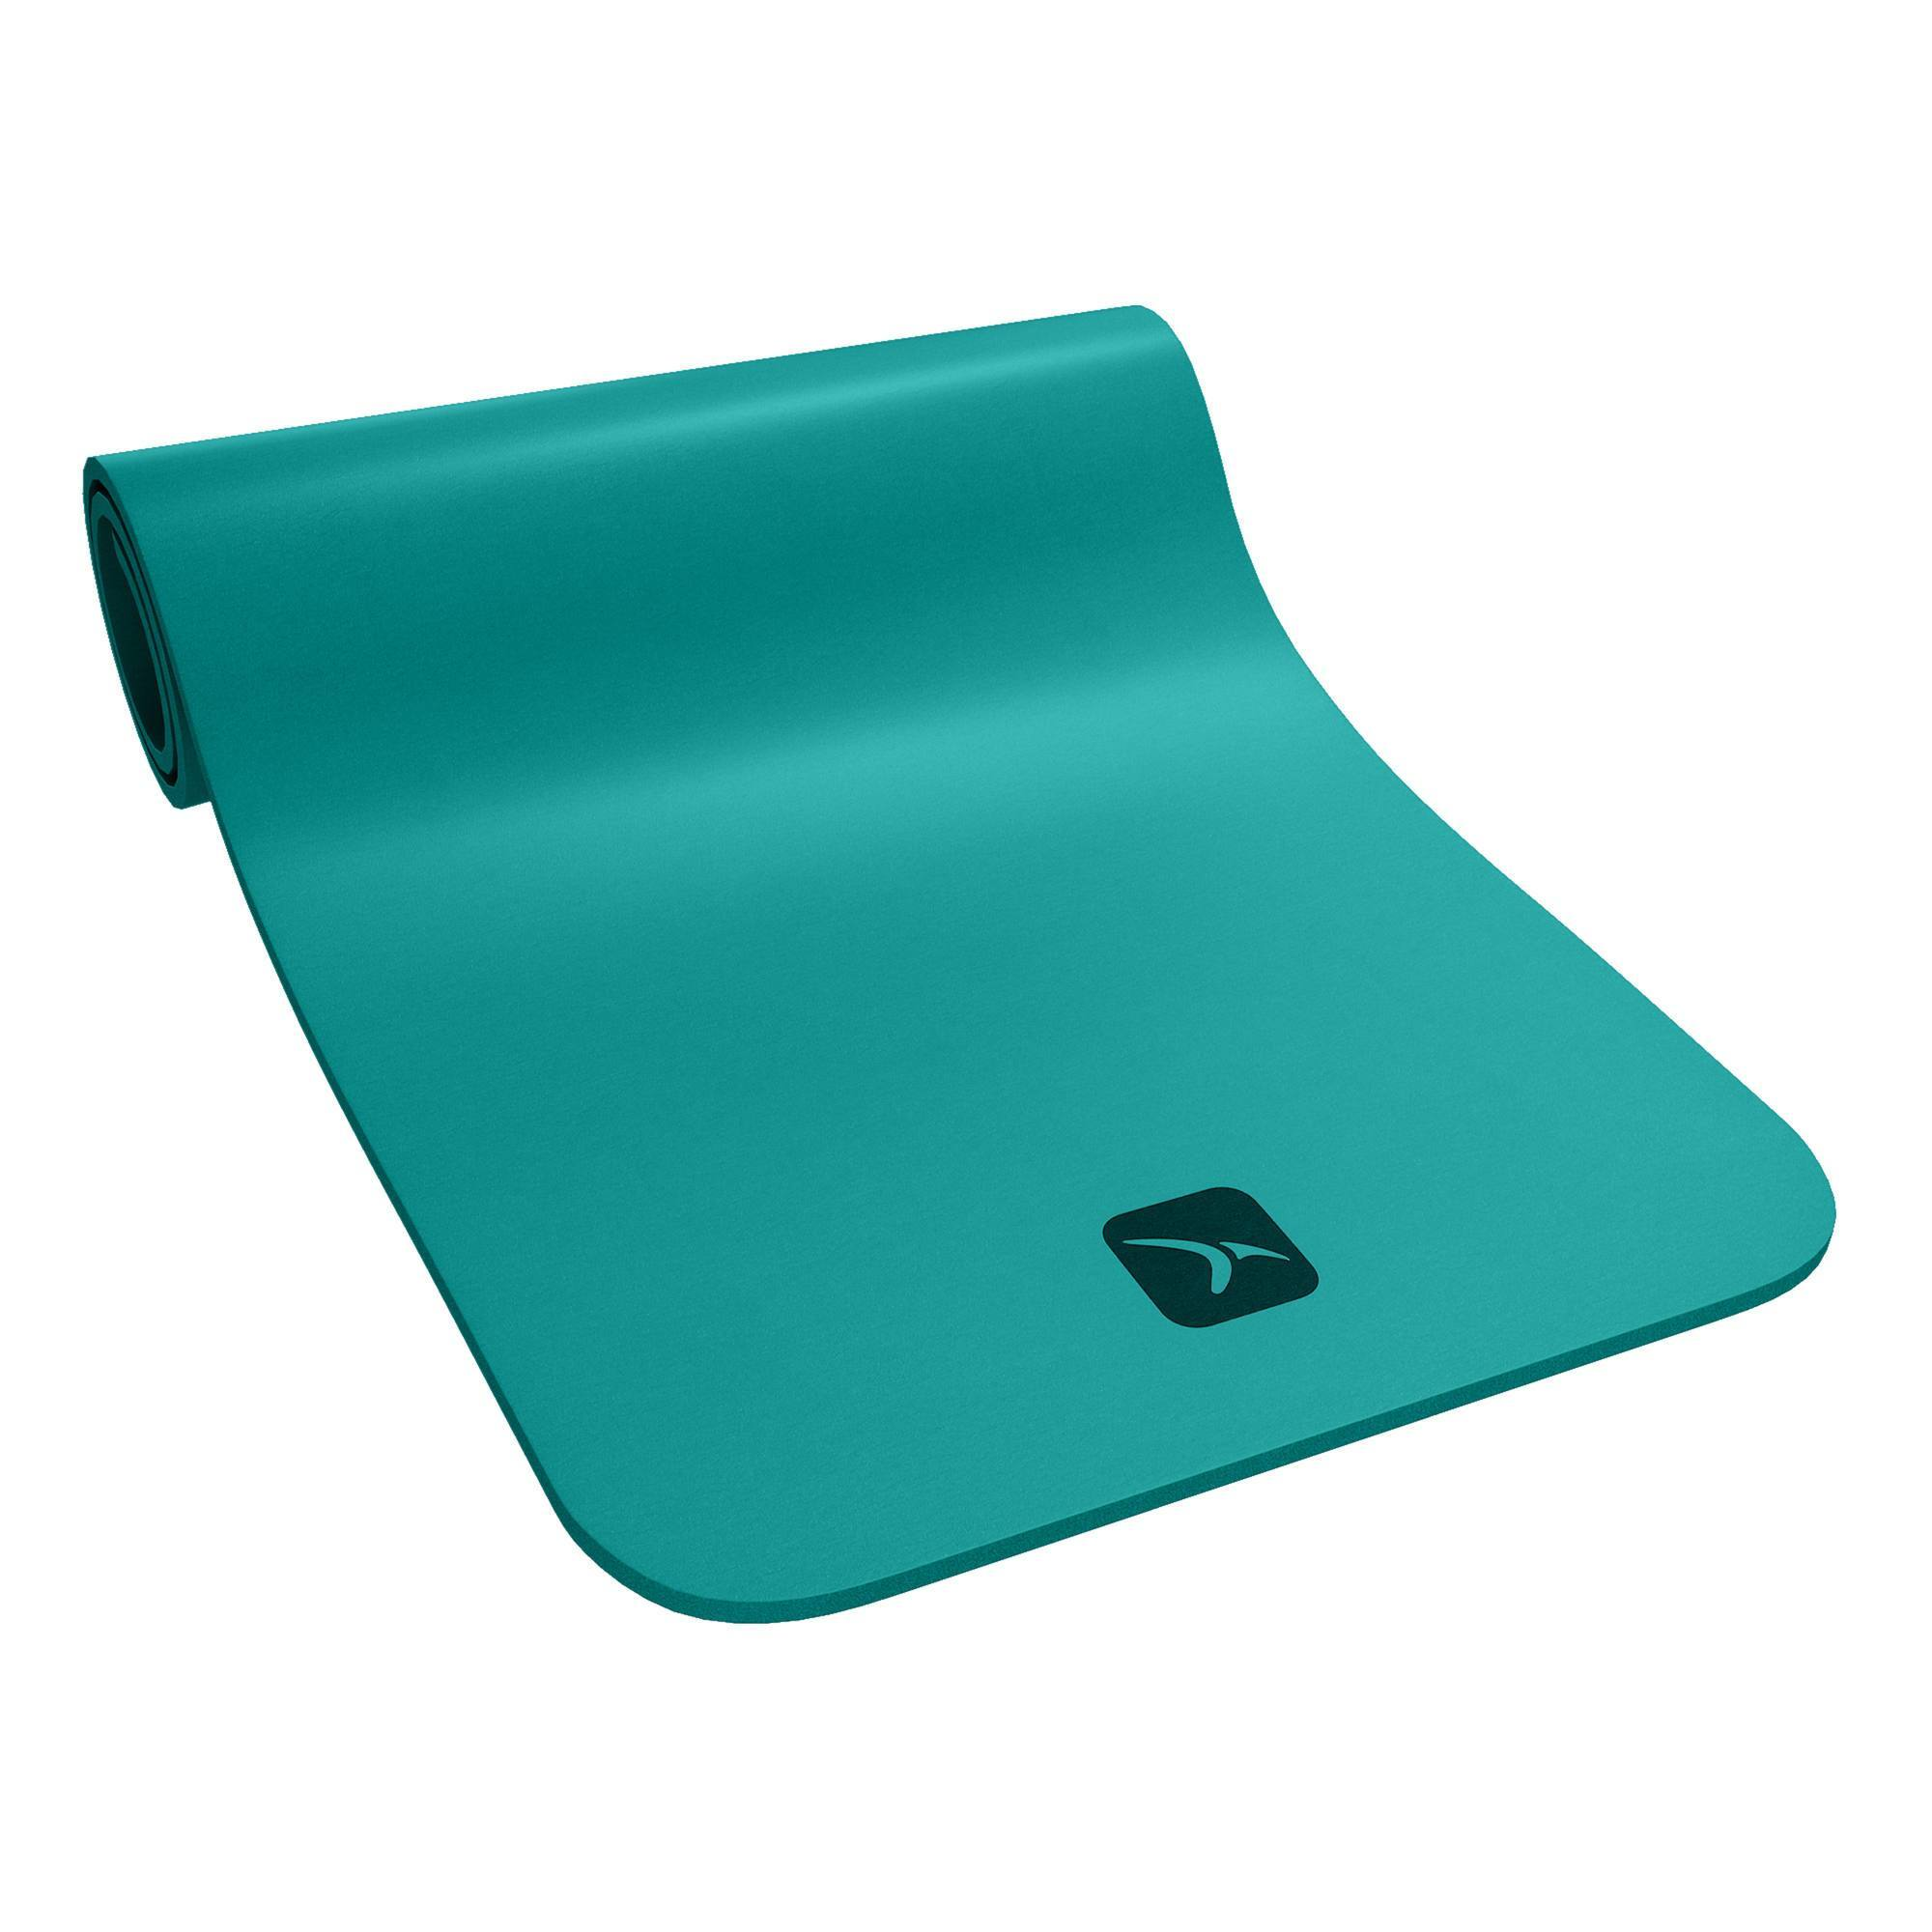 Tapis Pilates confort Vert